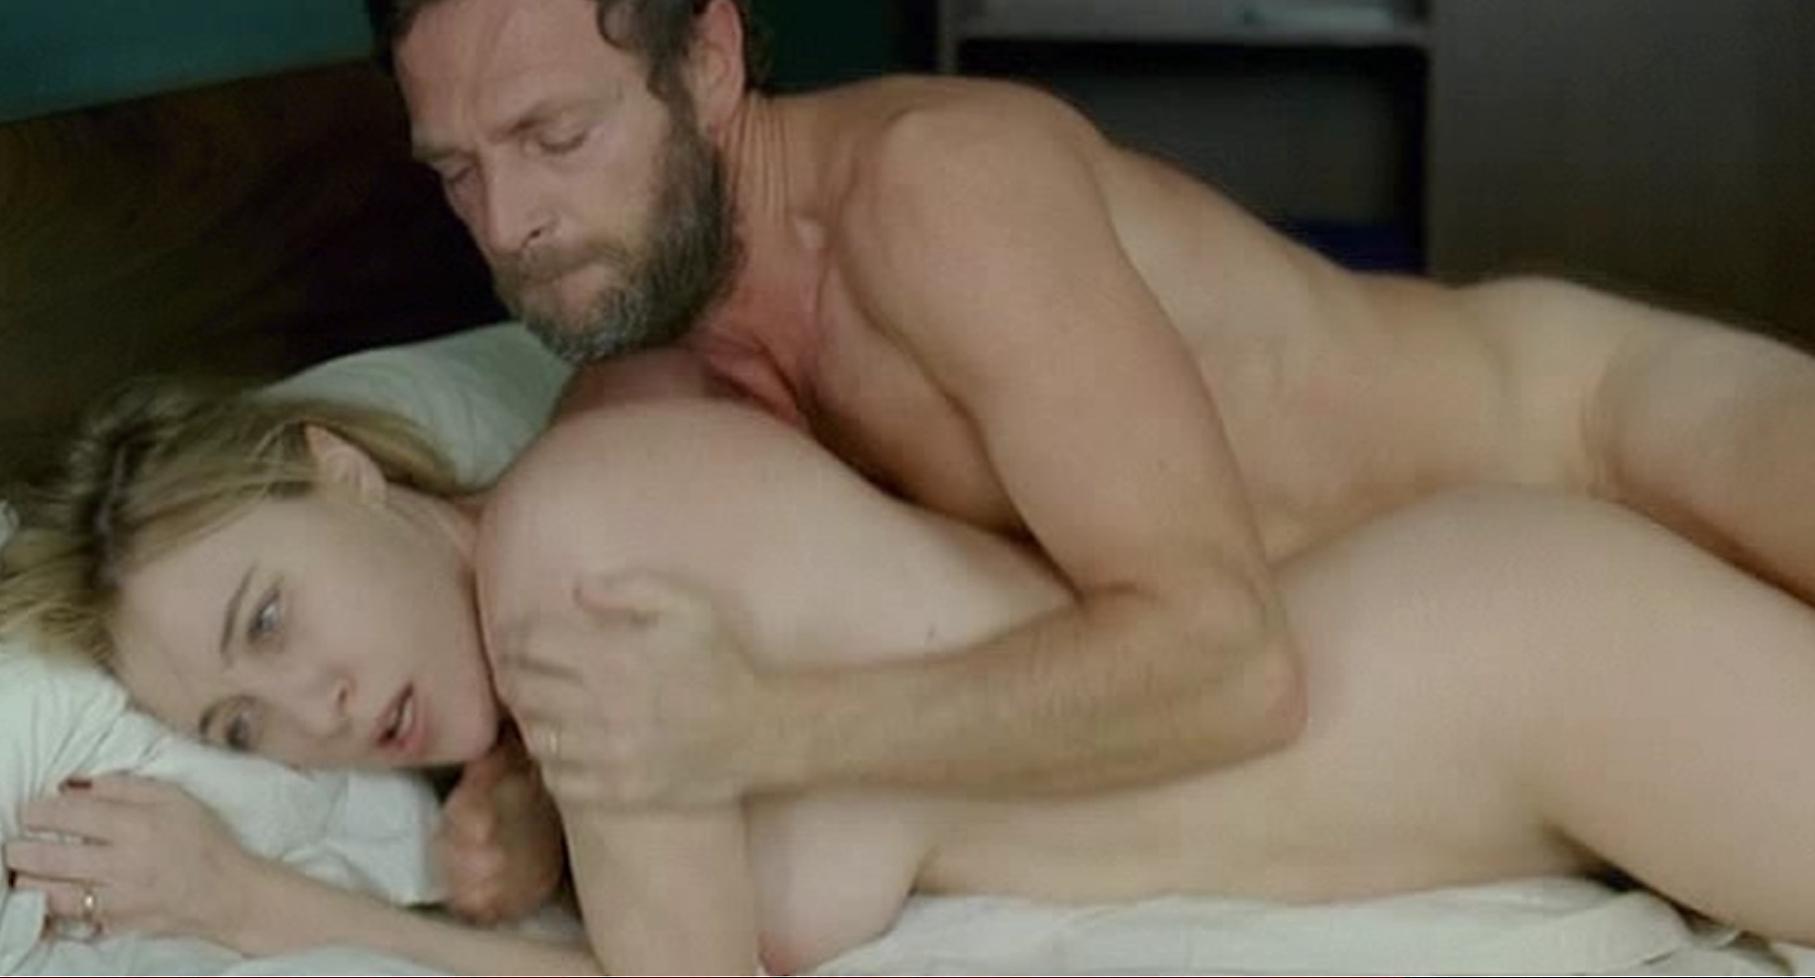 Valeria bruni tedeschi nude forced anal sex scene naked (63 photos), Instagram Celebrites photos